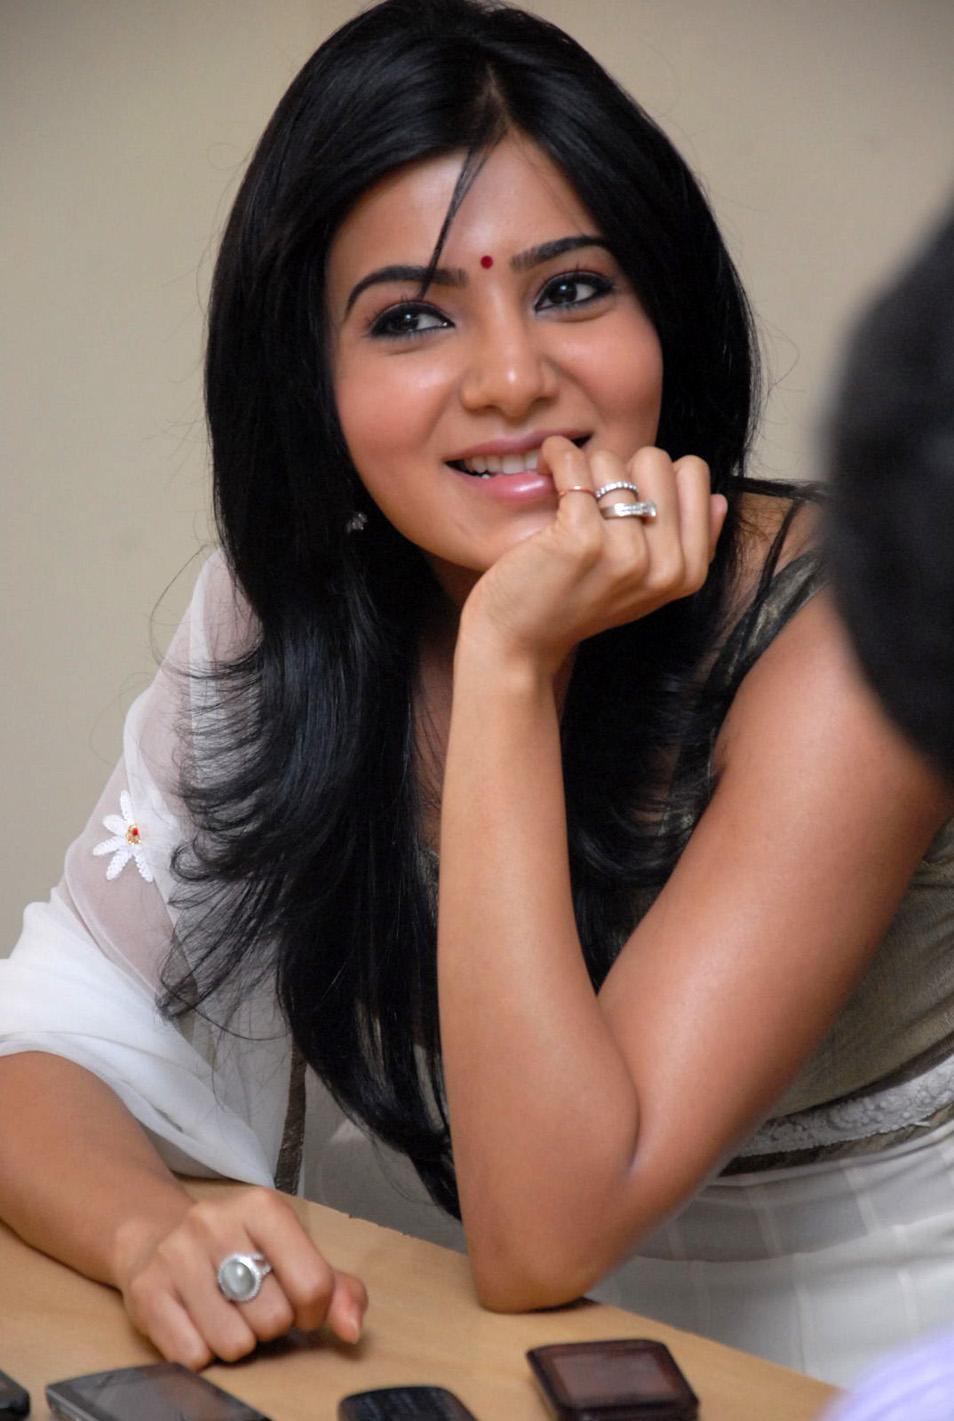 south indian actress wallpapers in hd: samantha ruth prabhu hd wallpaper